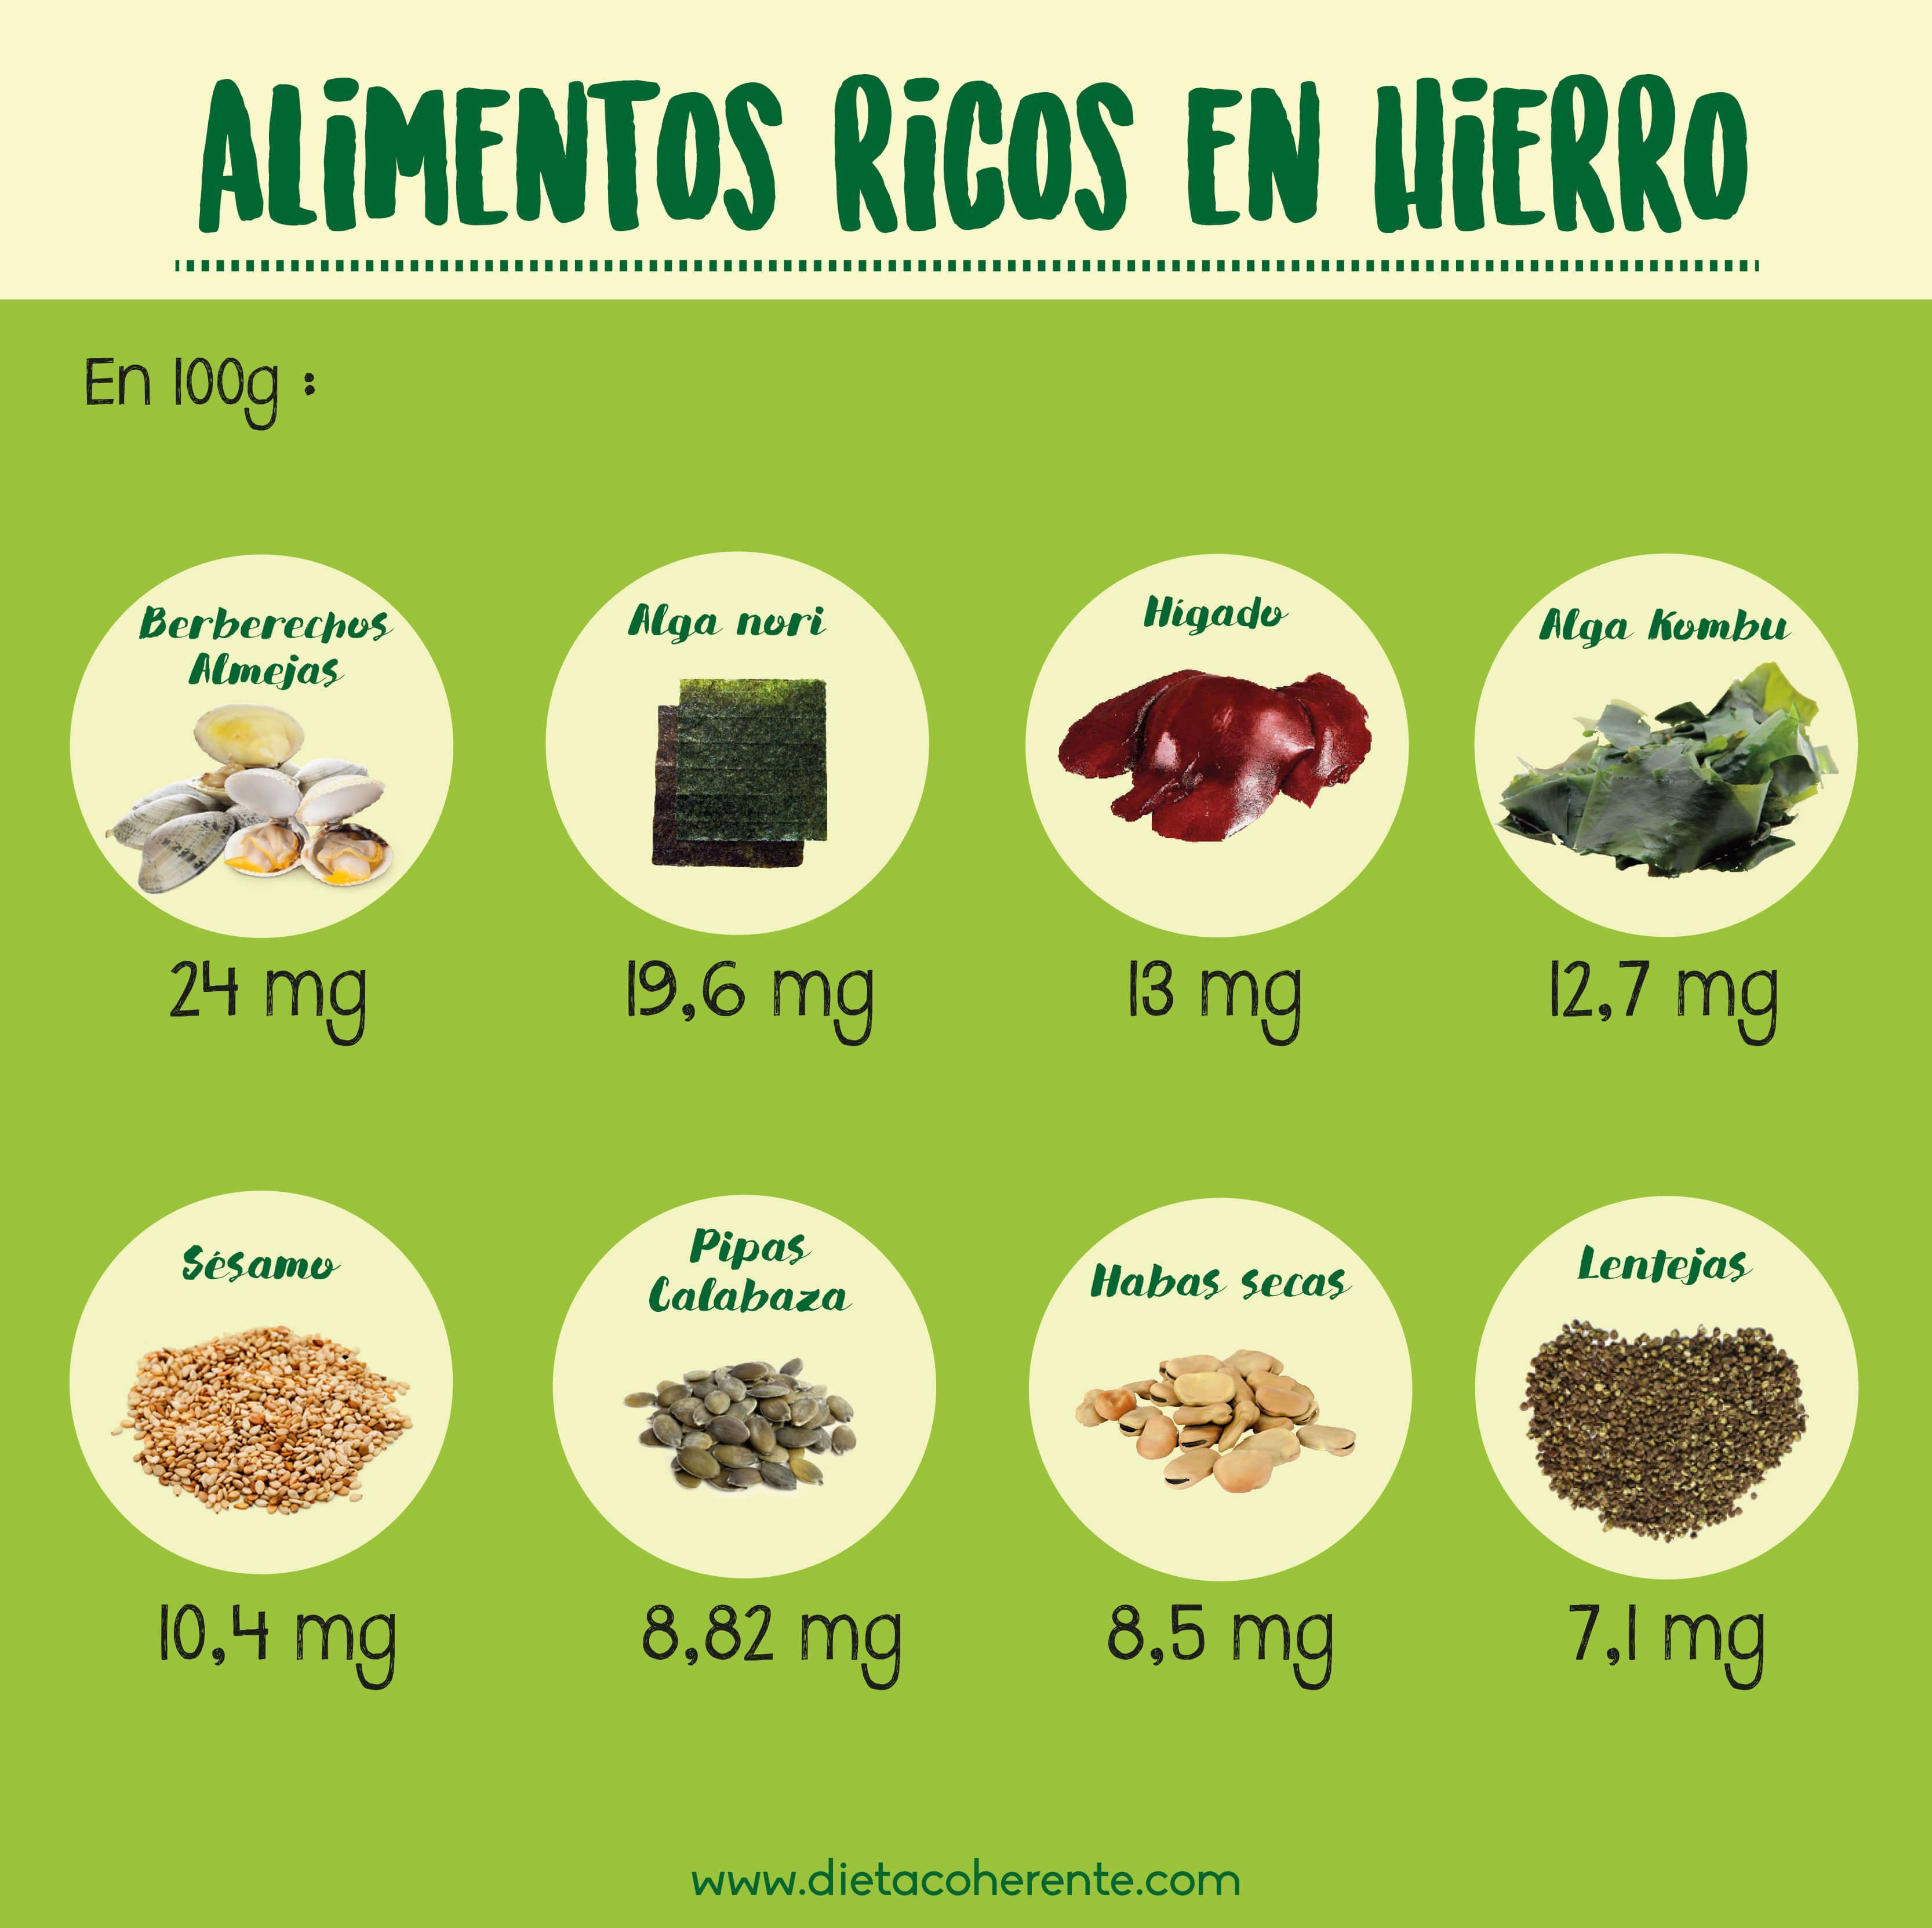 Dieta para aumentar hierro en sangre